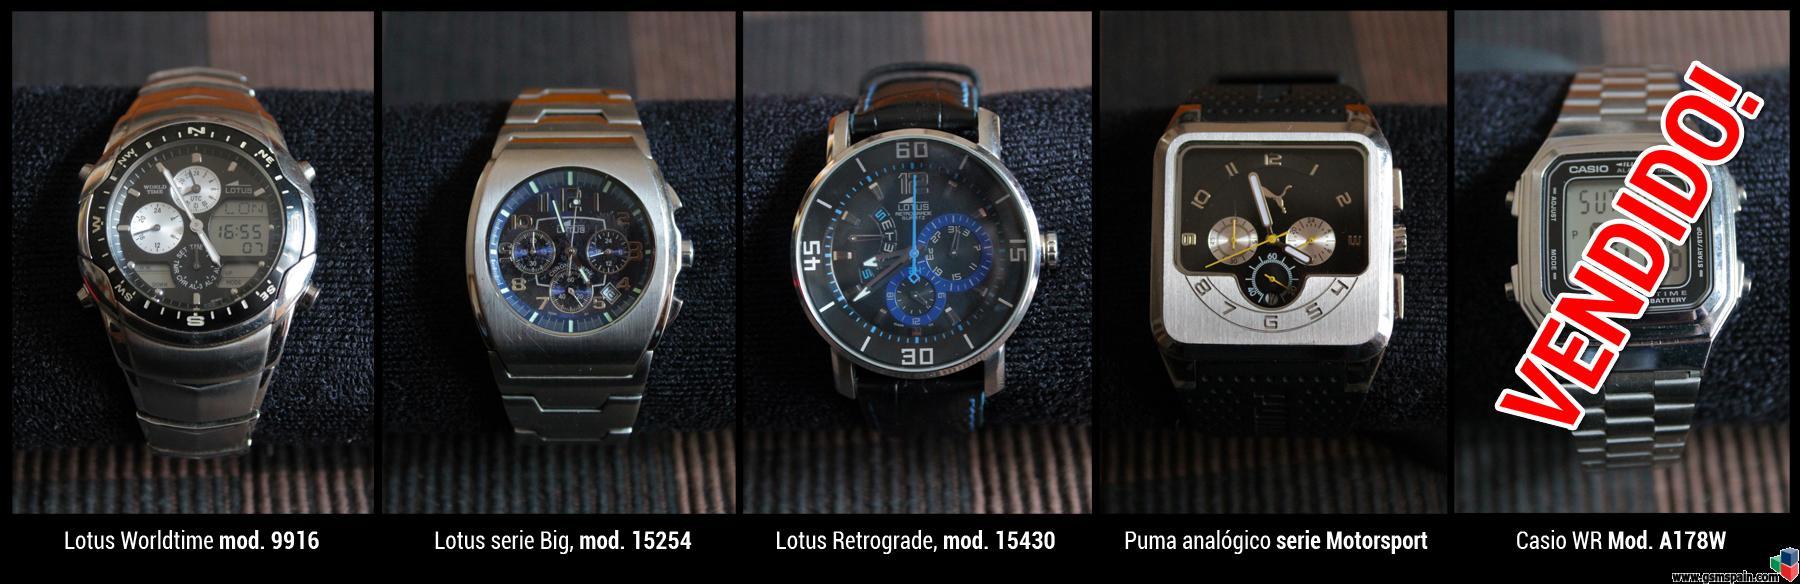 [VENDO] Relojes Lotus, Puma y Casio